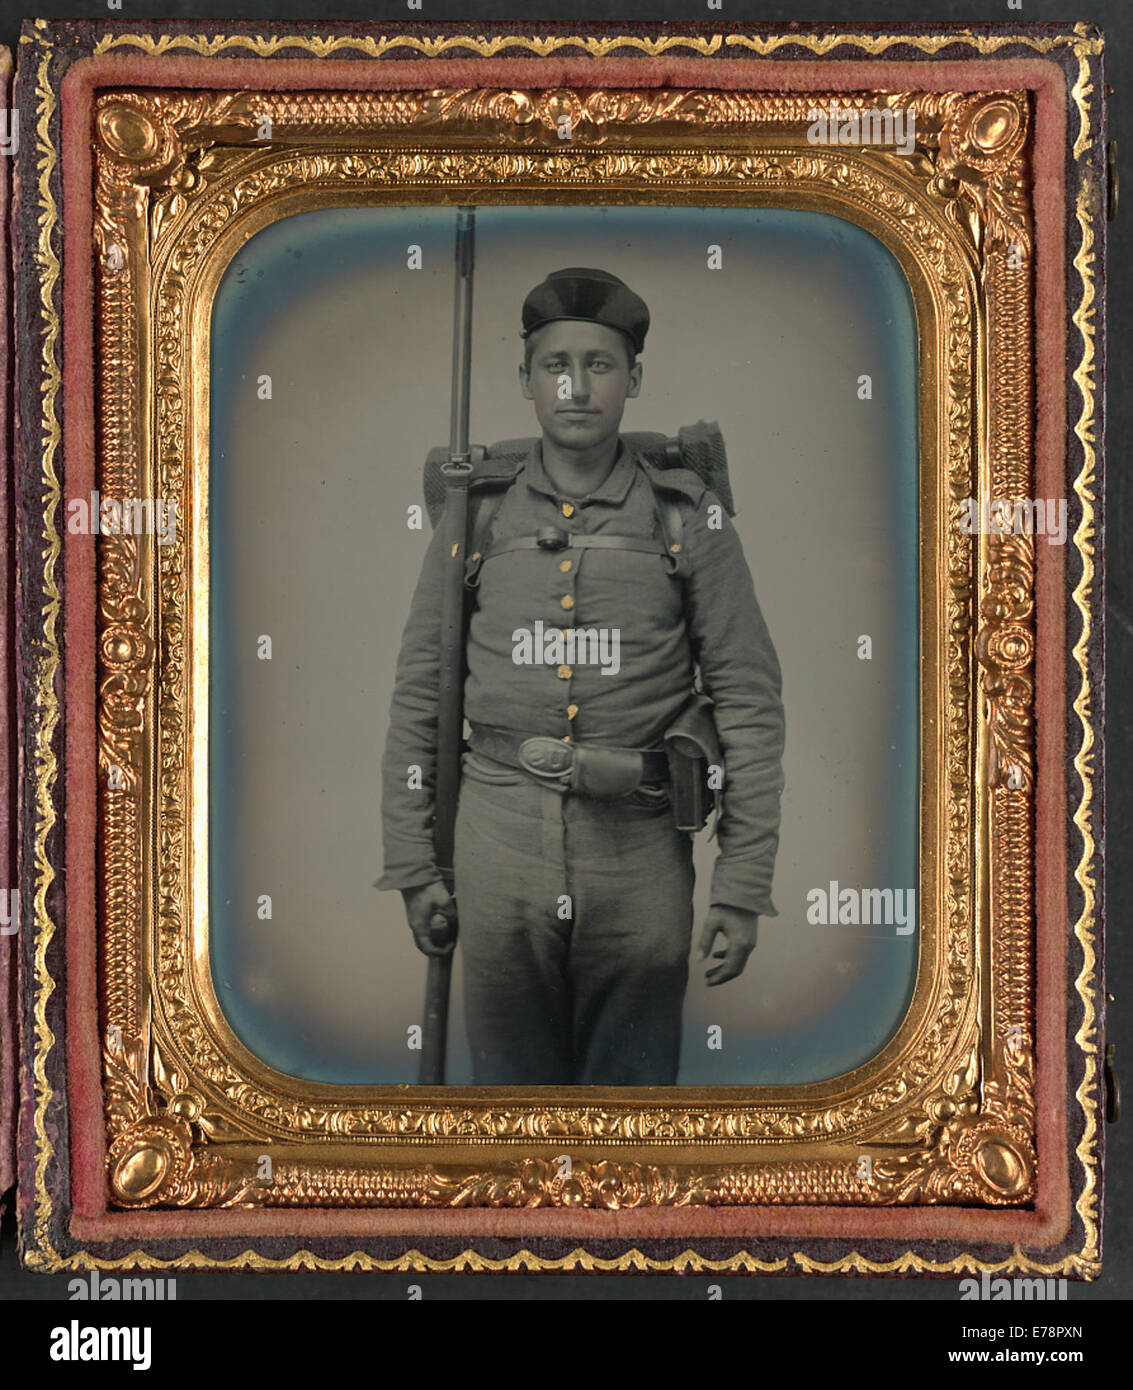 [Unidentified soldier in Ohio Volunteer Militia uniform with bedroll - Stock Image